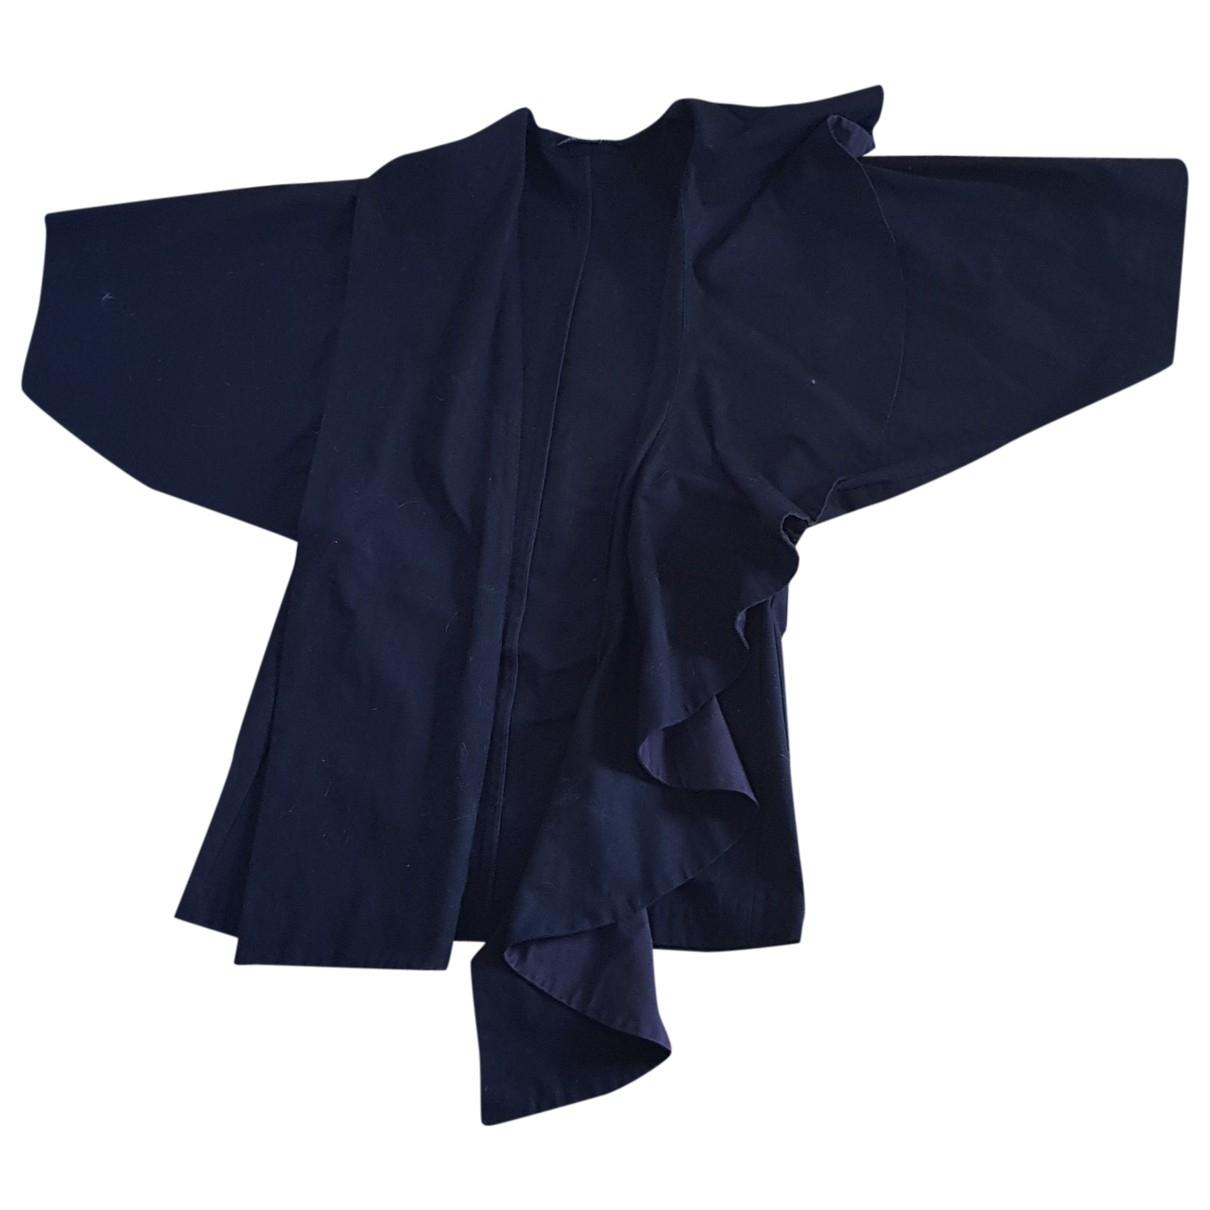 Yohji Yamamoto - Manteau   pour femme en coton - noir